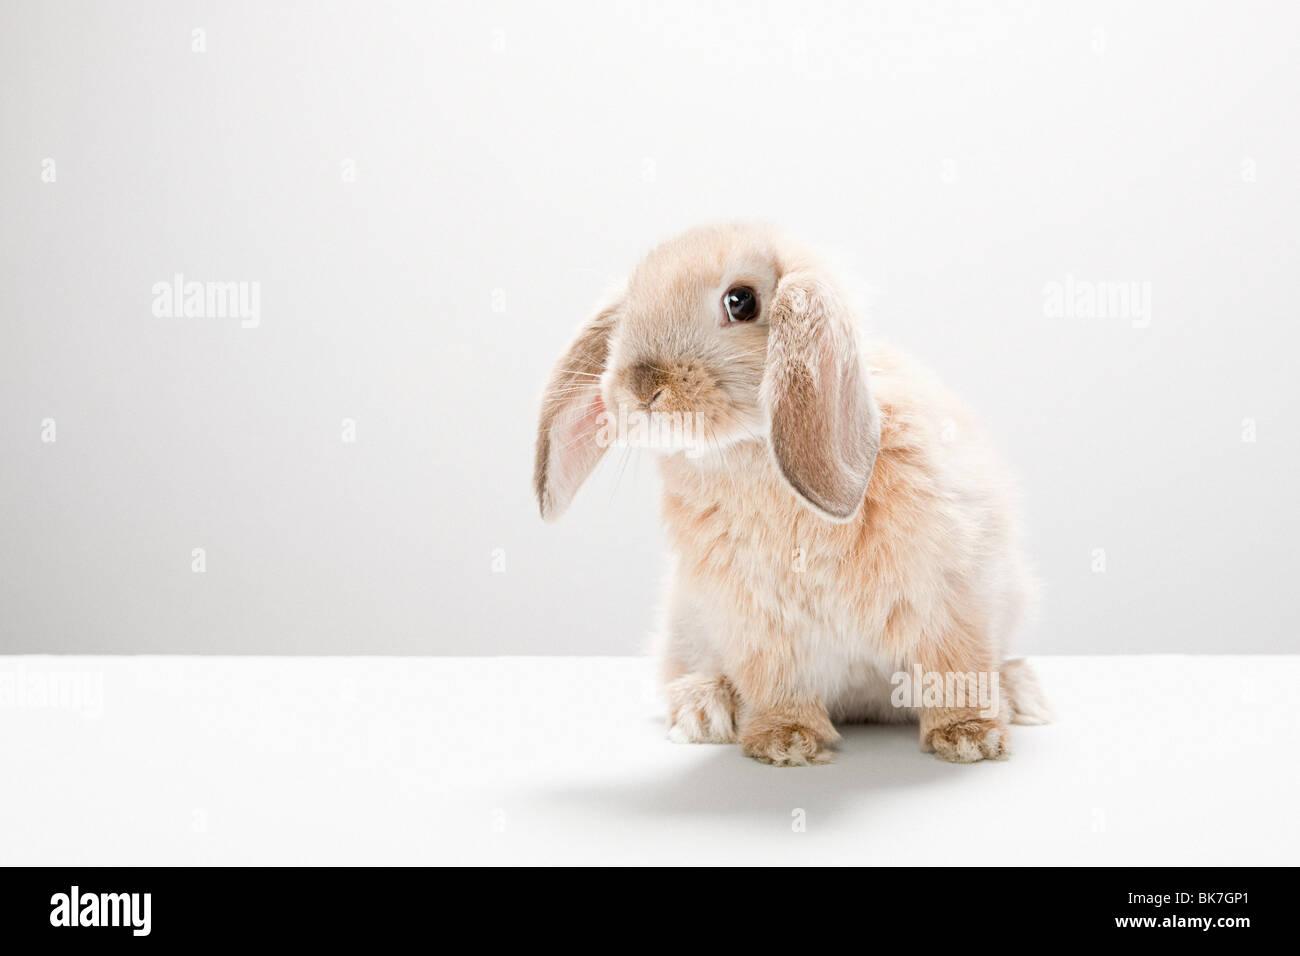 Portrait of a rabbit - Stock Image